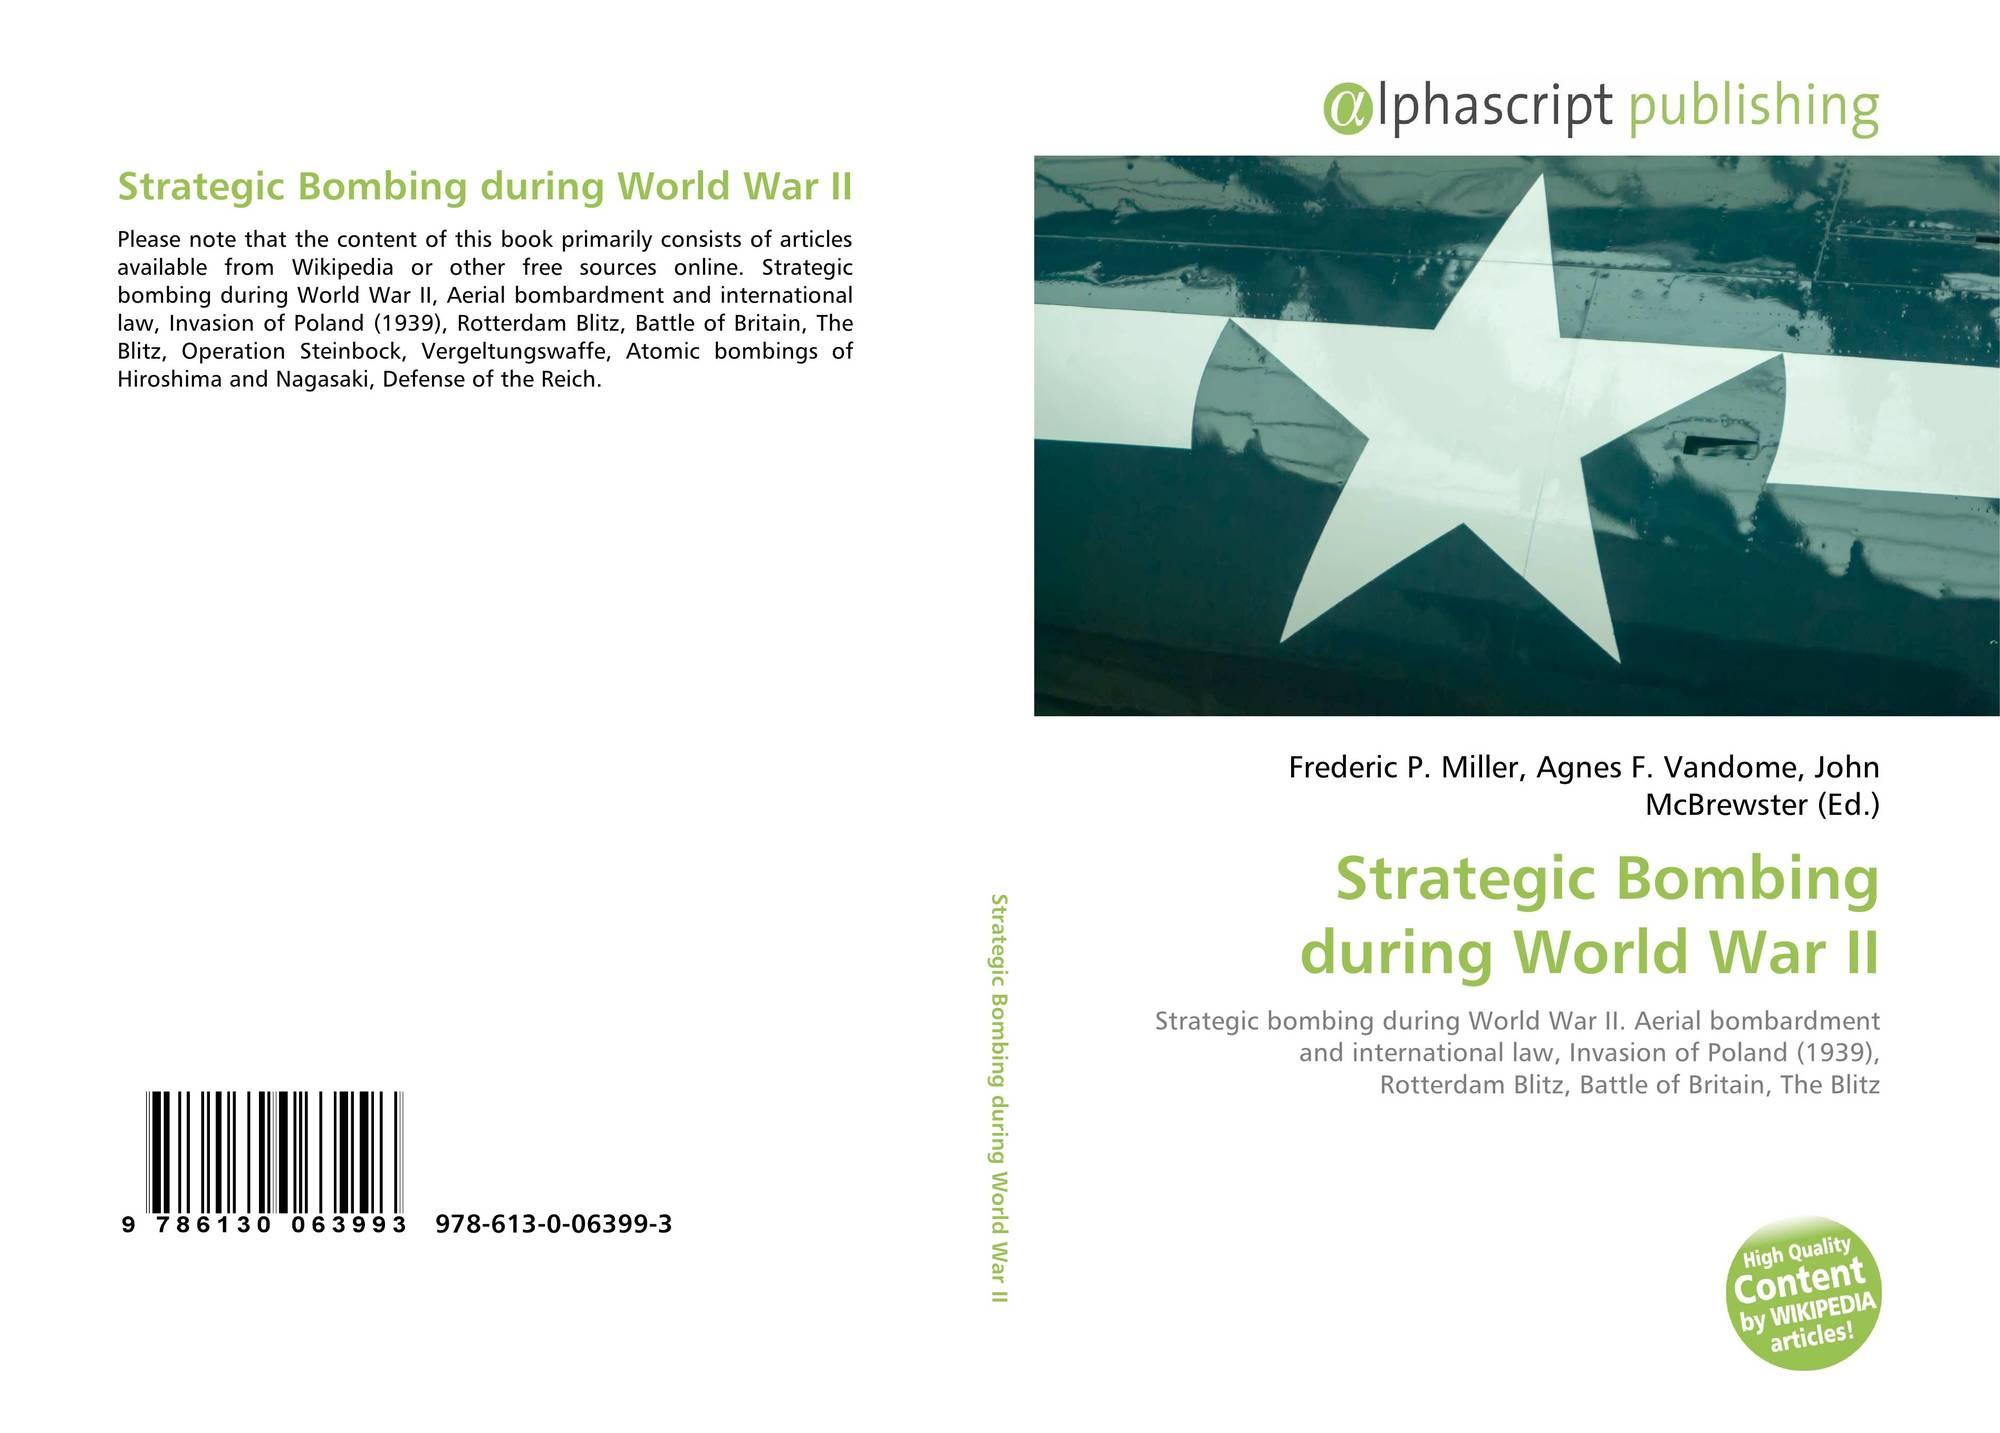 an analysis of strategic bombings during world war ii